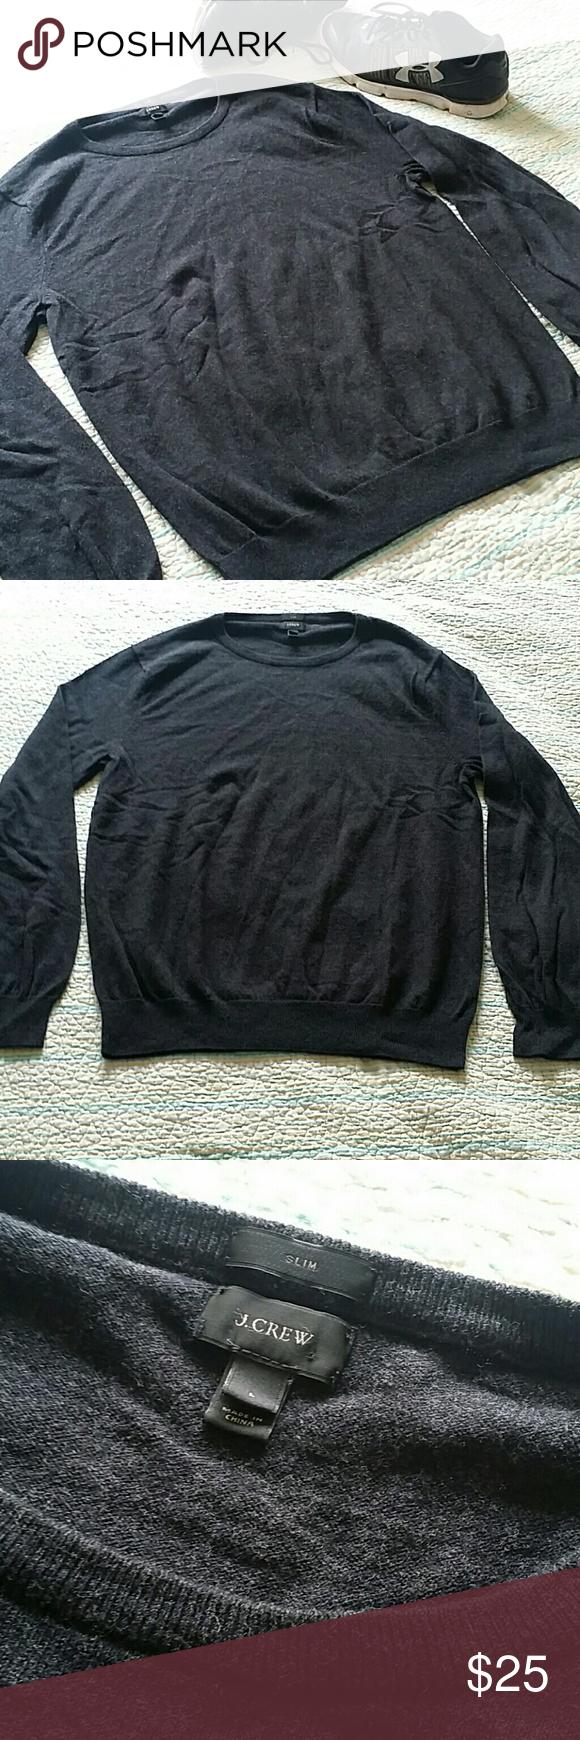 J.CREW Slim Fit Gray Cotton Cashmere Sweater Large | Crewneck ...